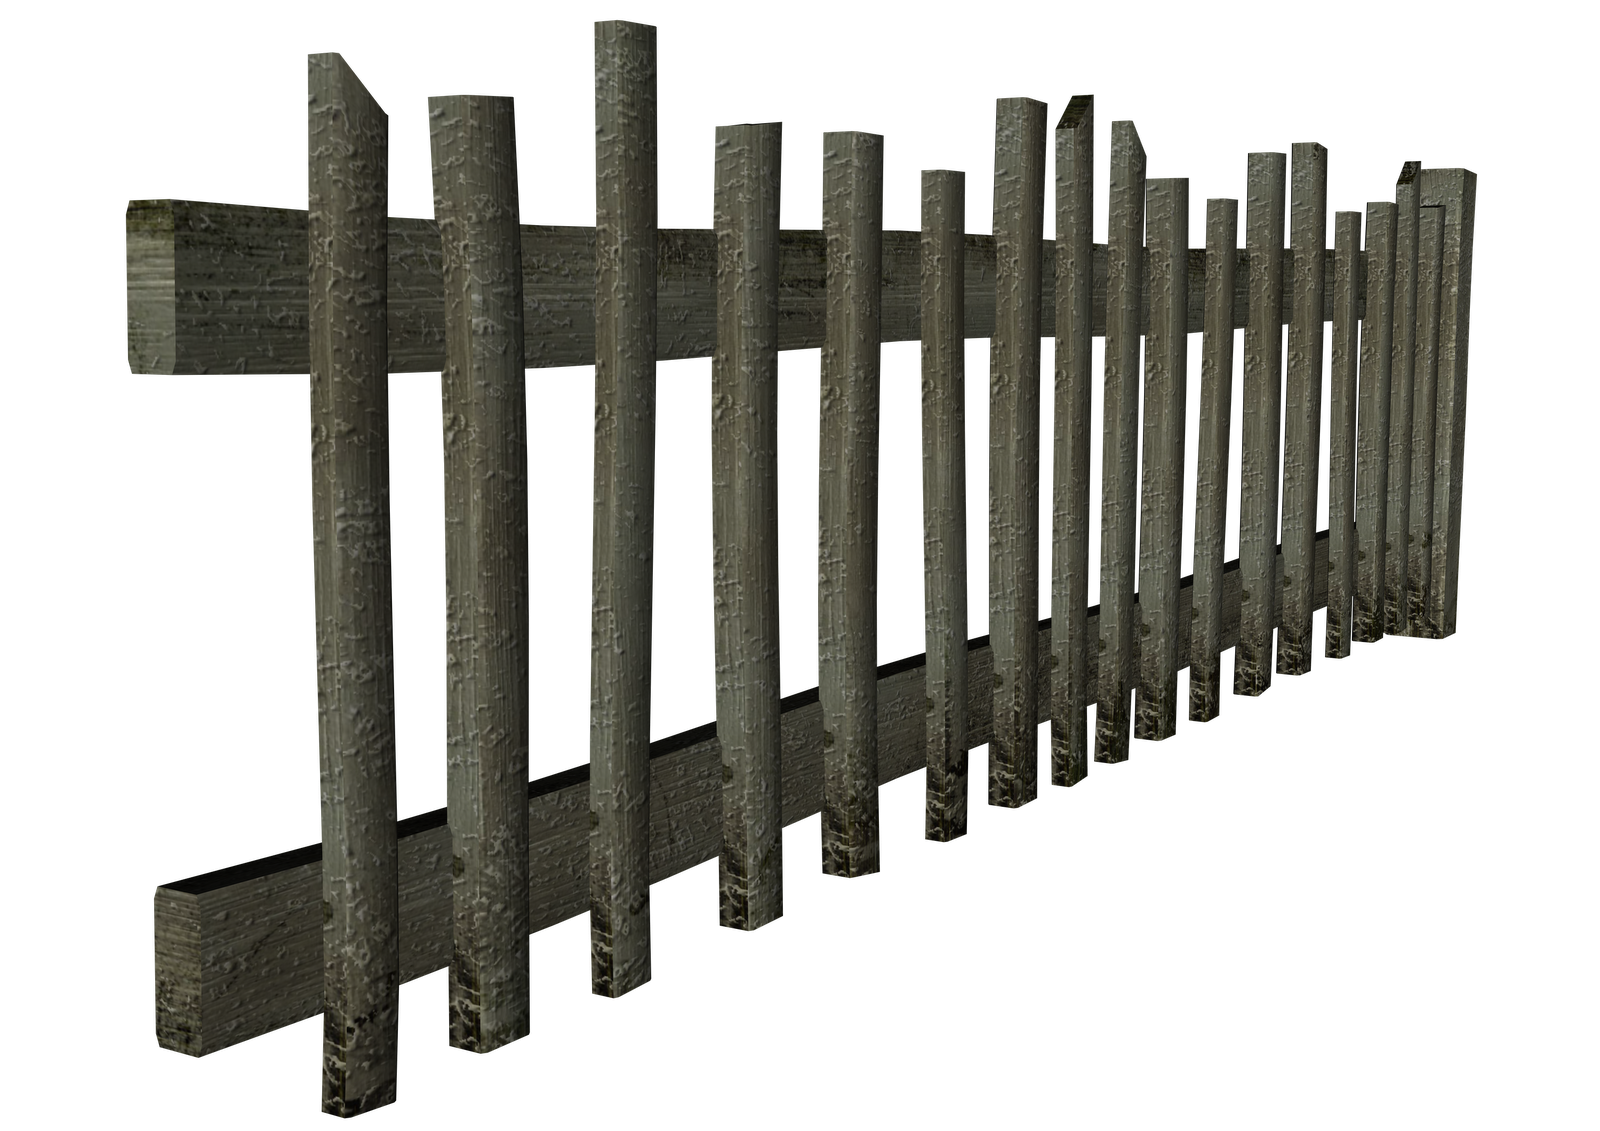 clipart freeuse stock Broken clipart fence repair. Clip art free panda